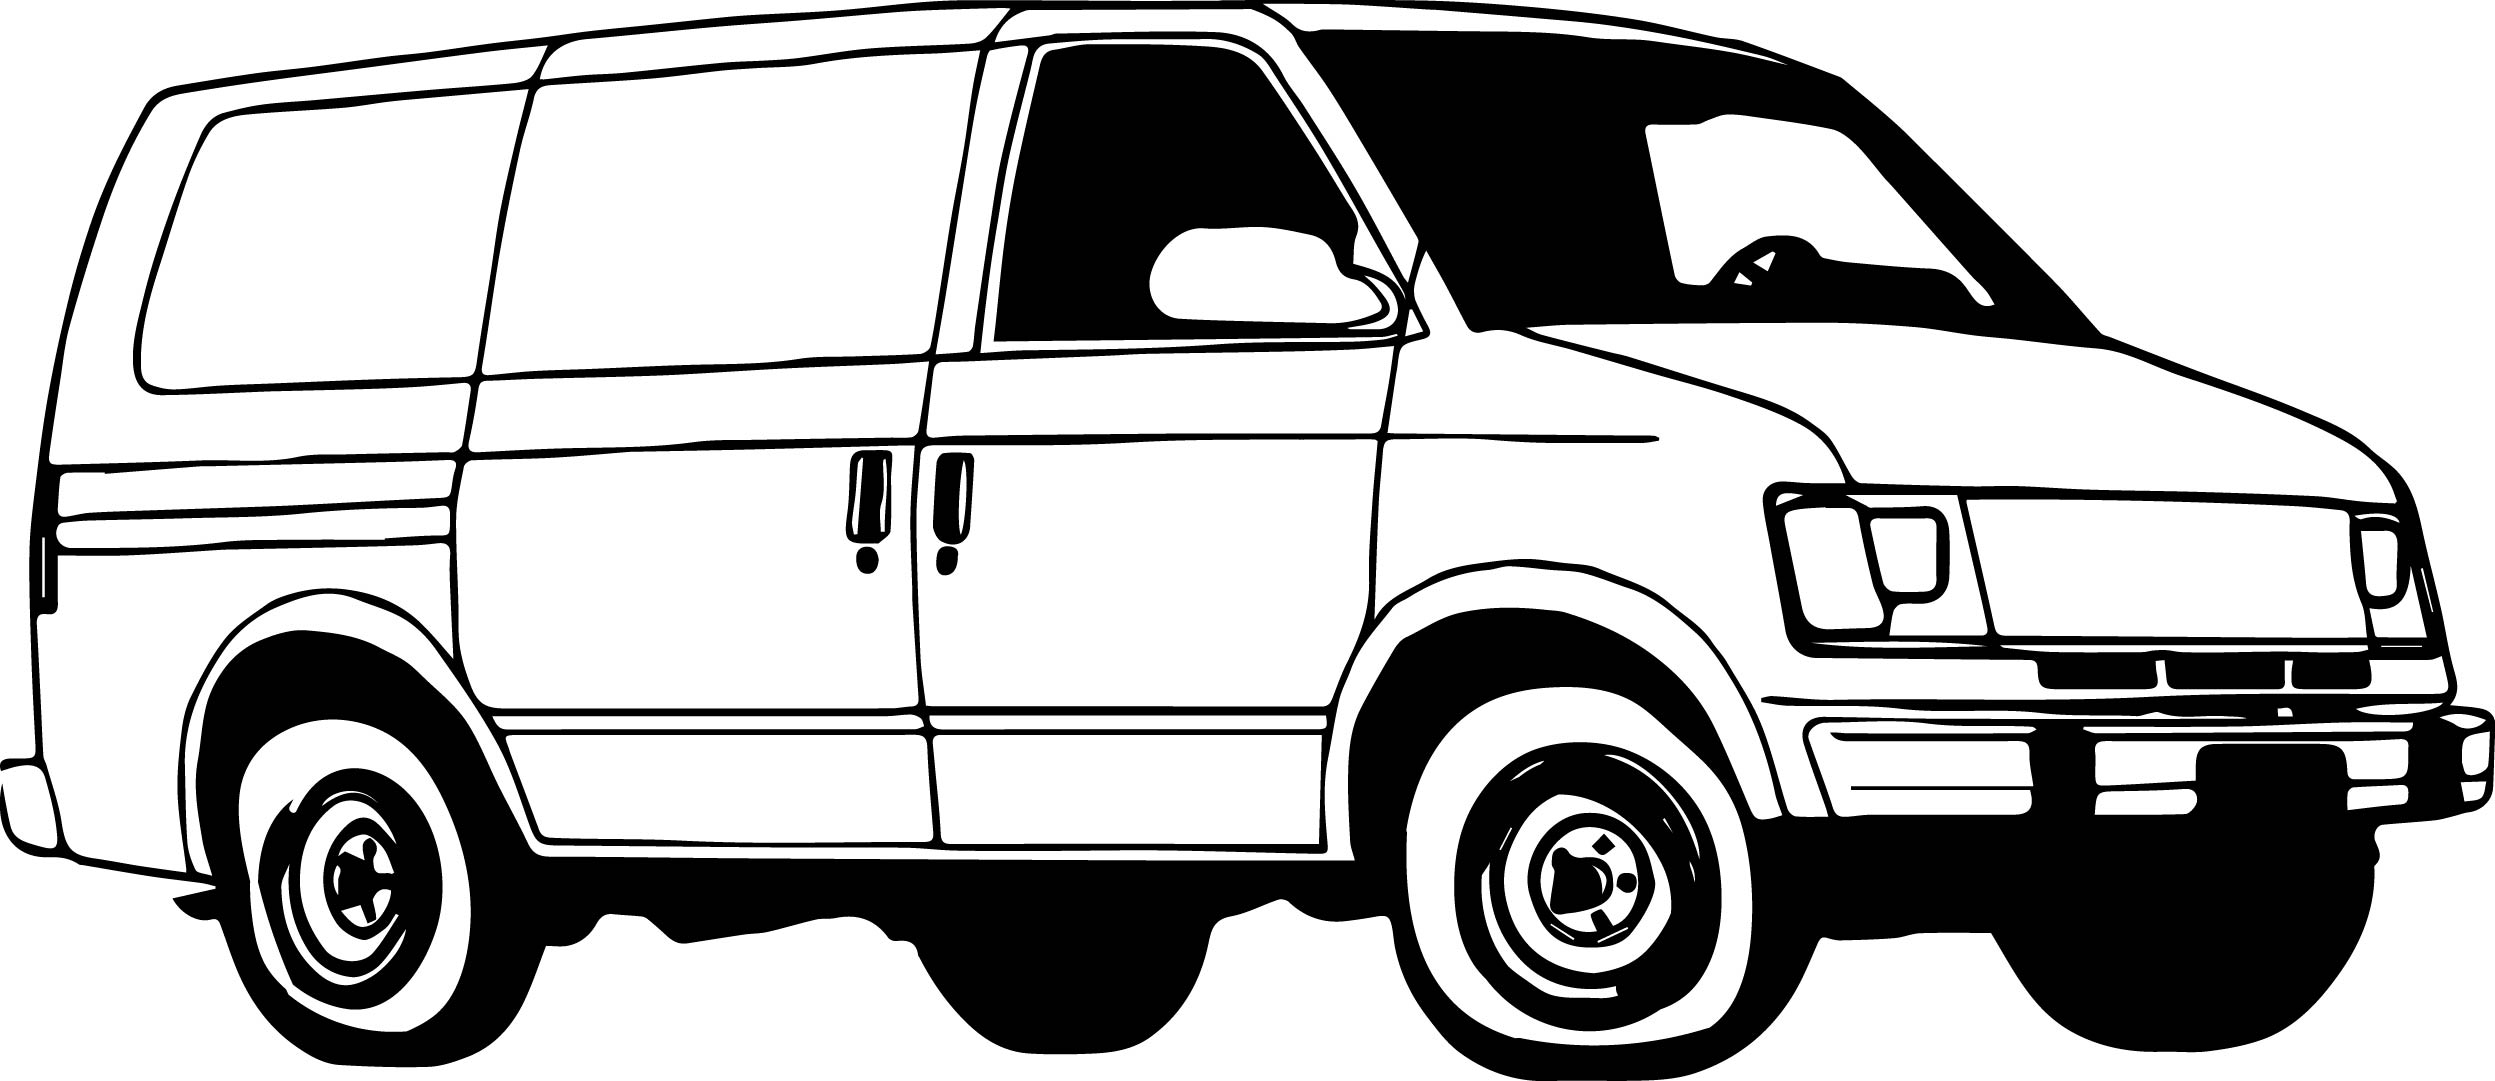 Coloring pages van - Minibus Van Coloring Page